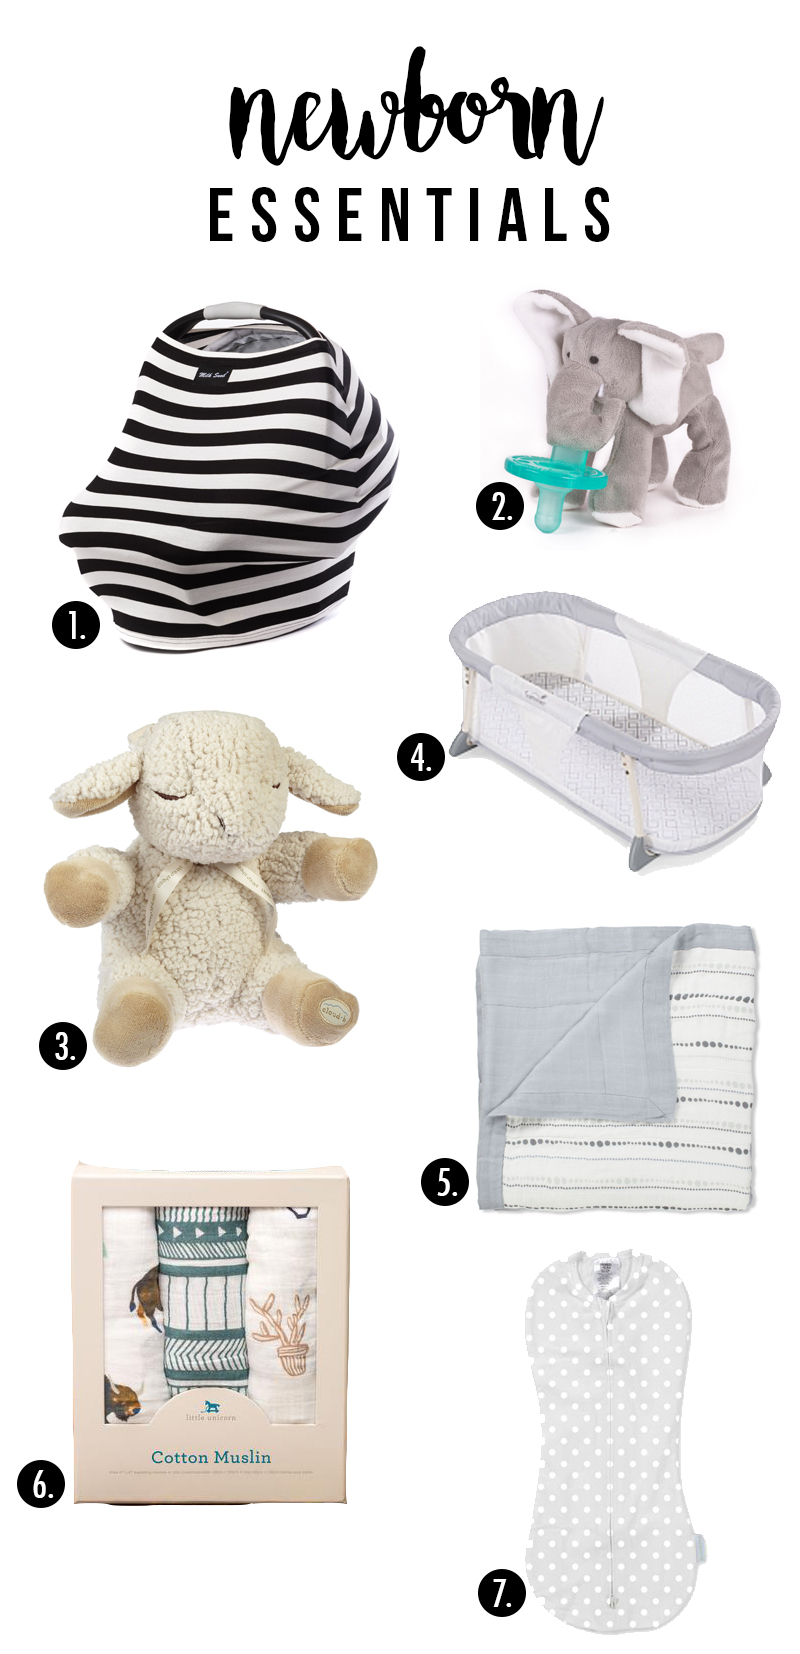 Essentials for your newborn